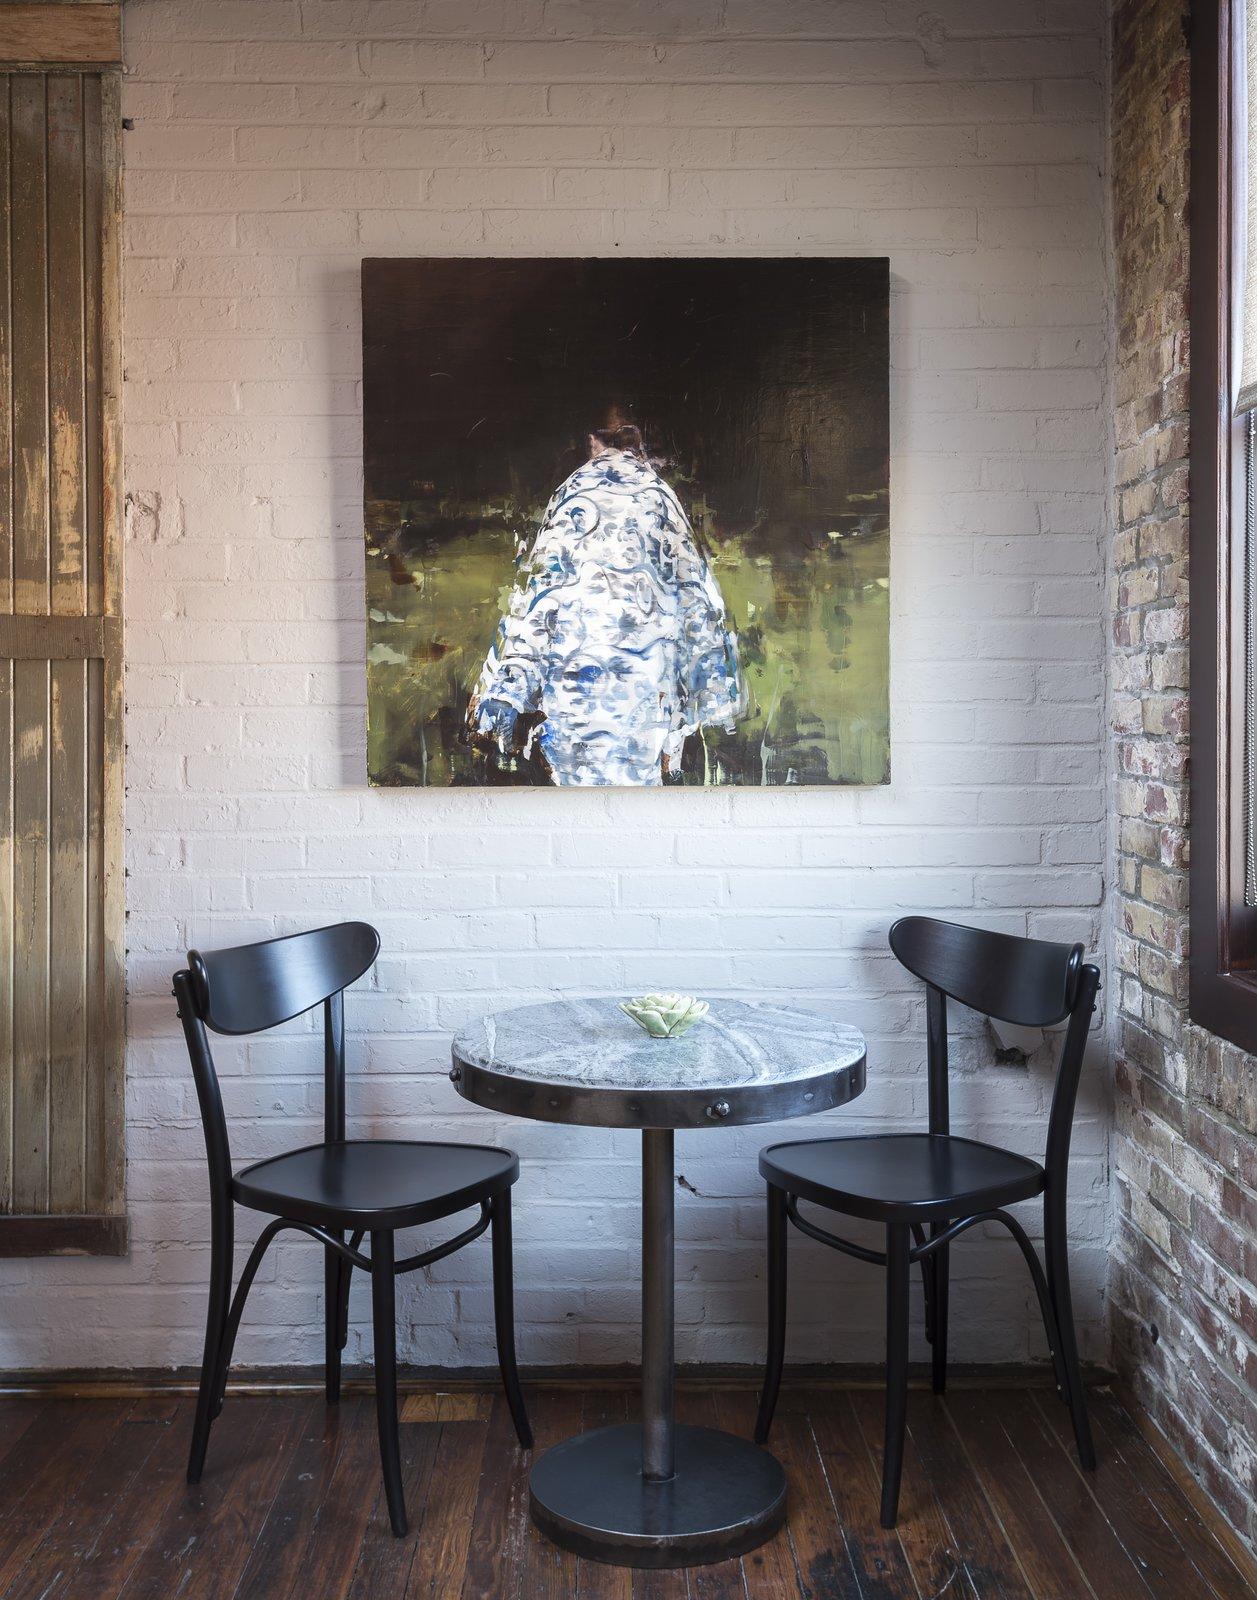 Dining Room, Chair, and Light Hardwood Floor  Mulherin's Hotel